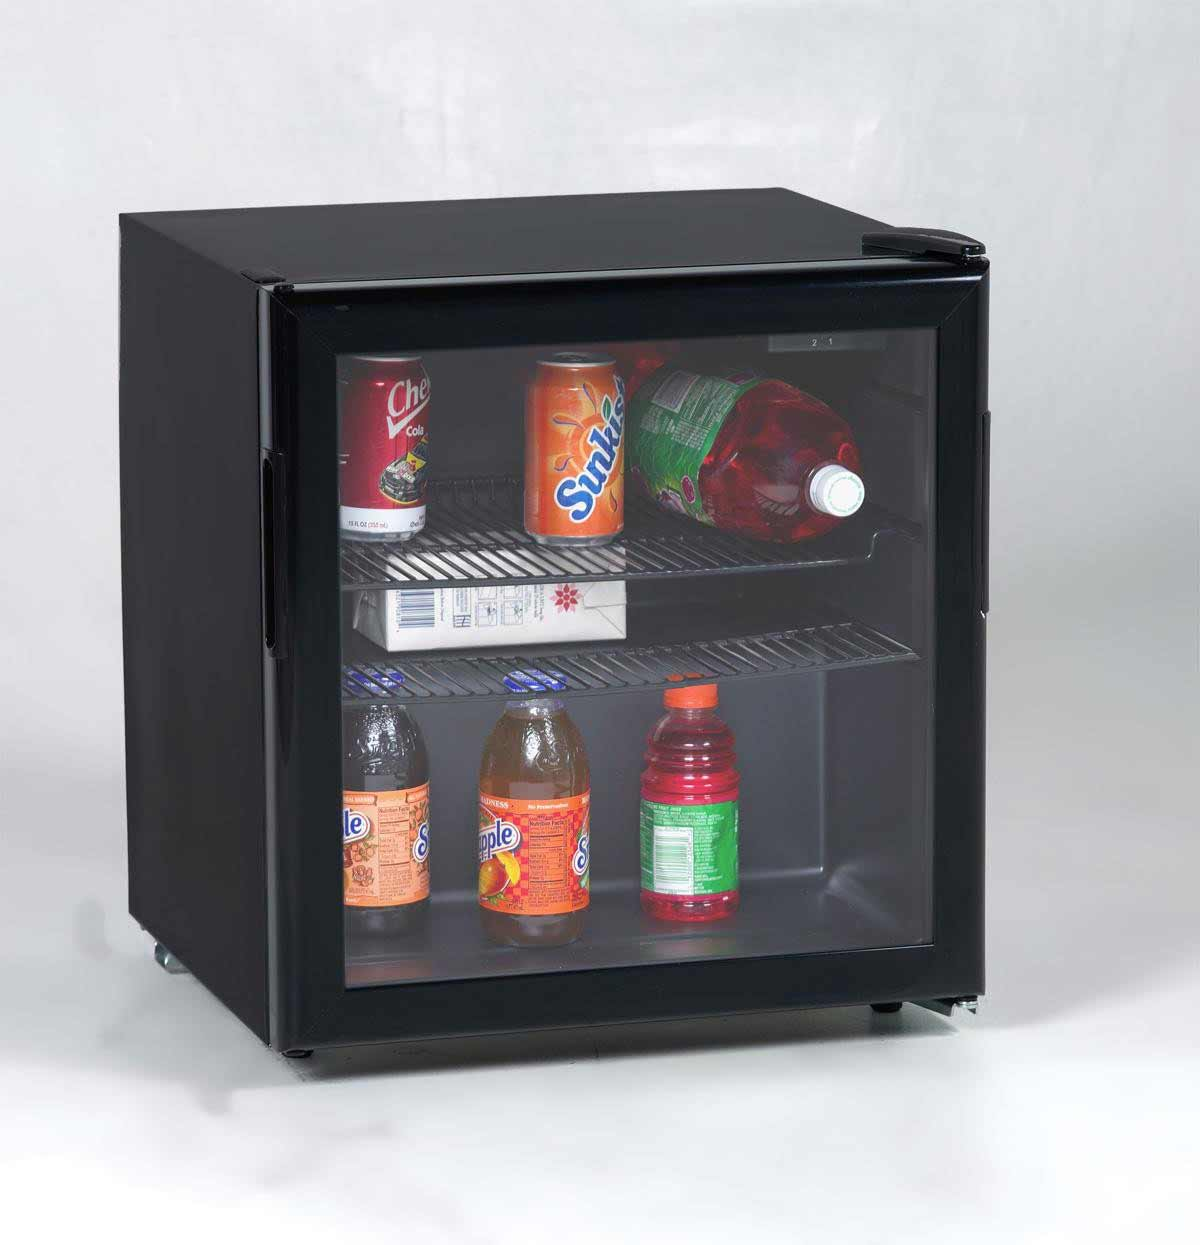 Avanti cubic foot beverage cooler refrigerator